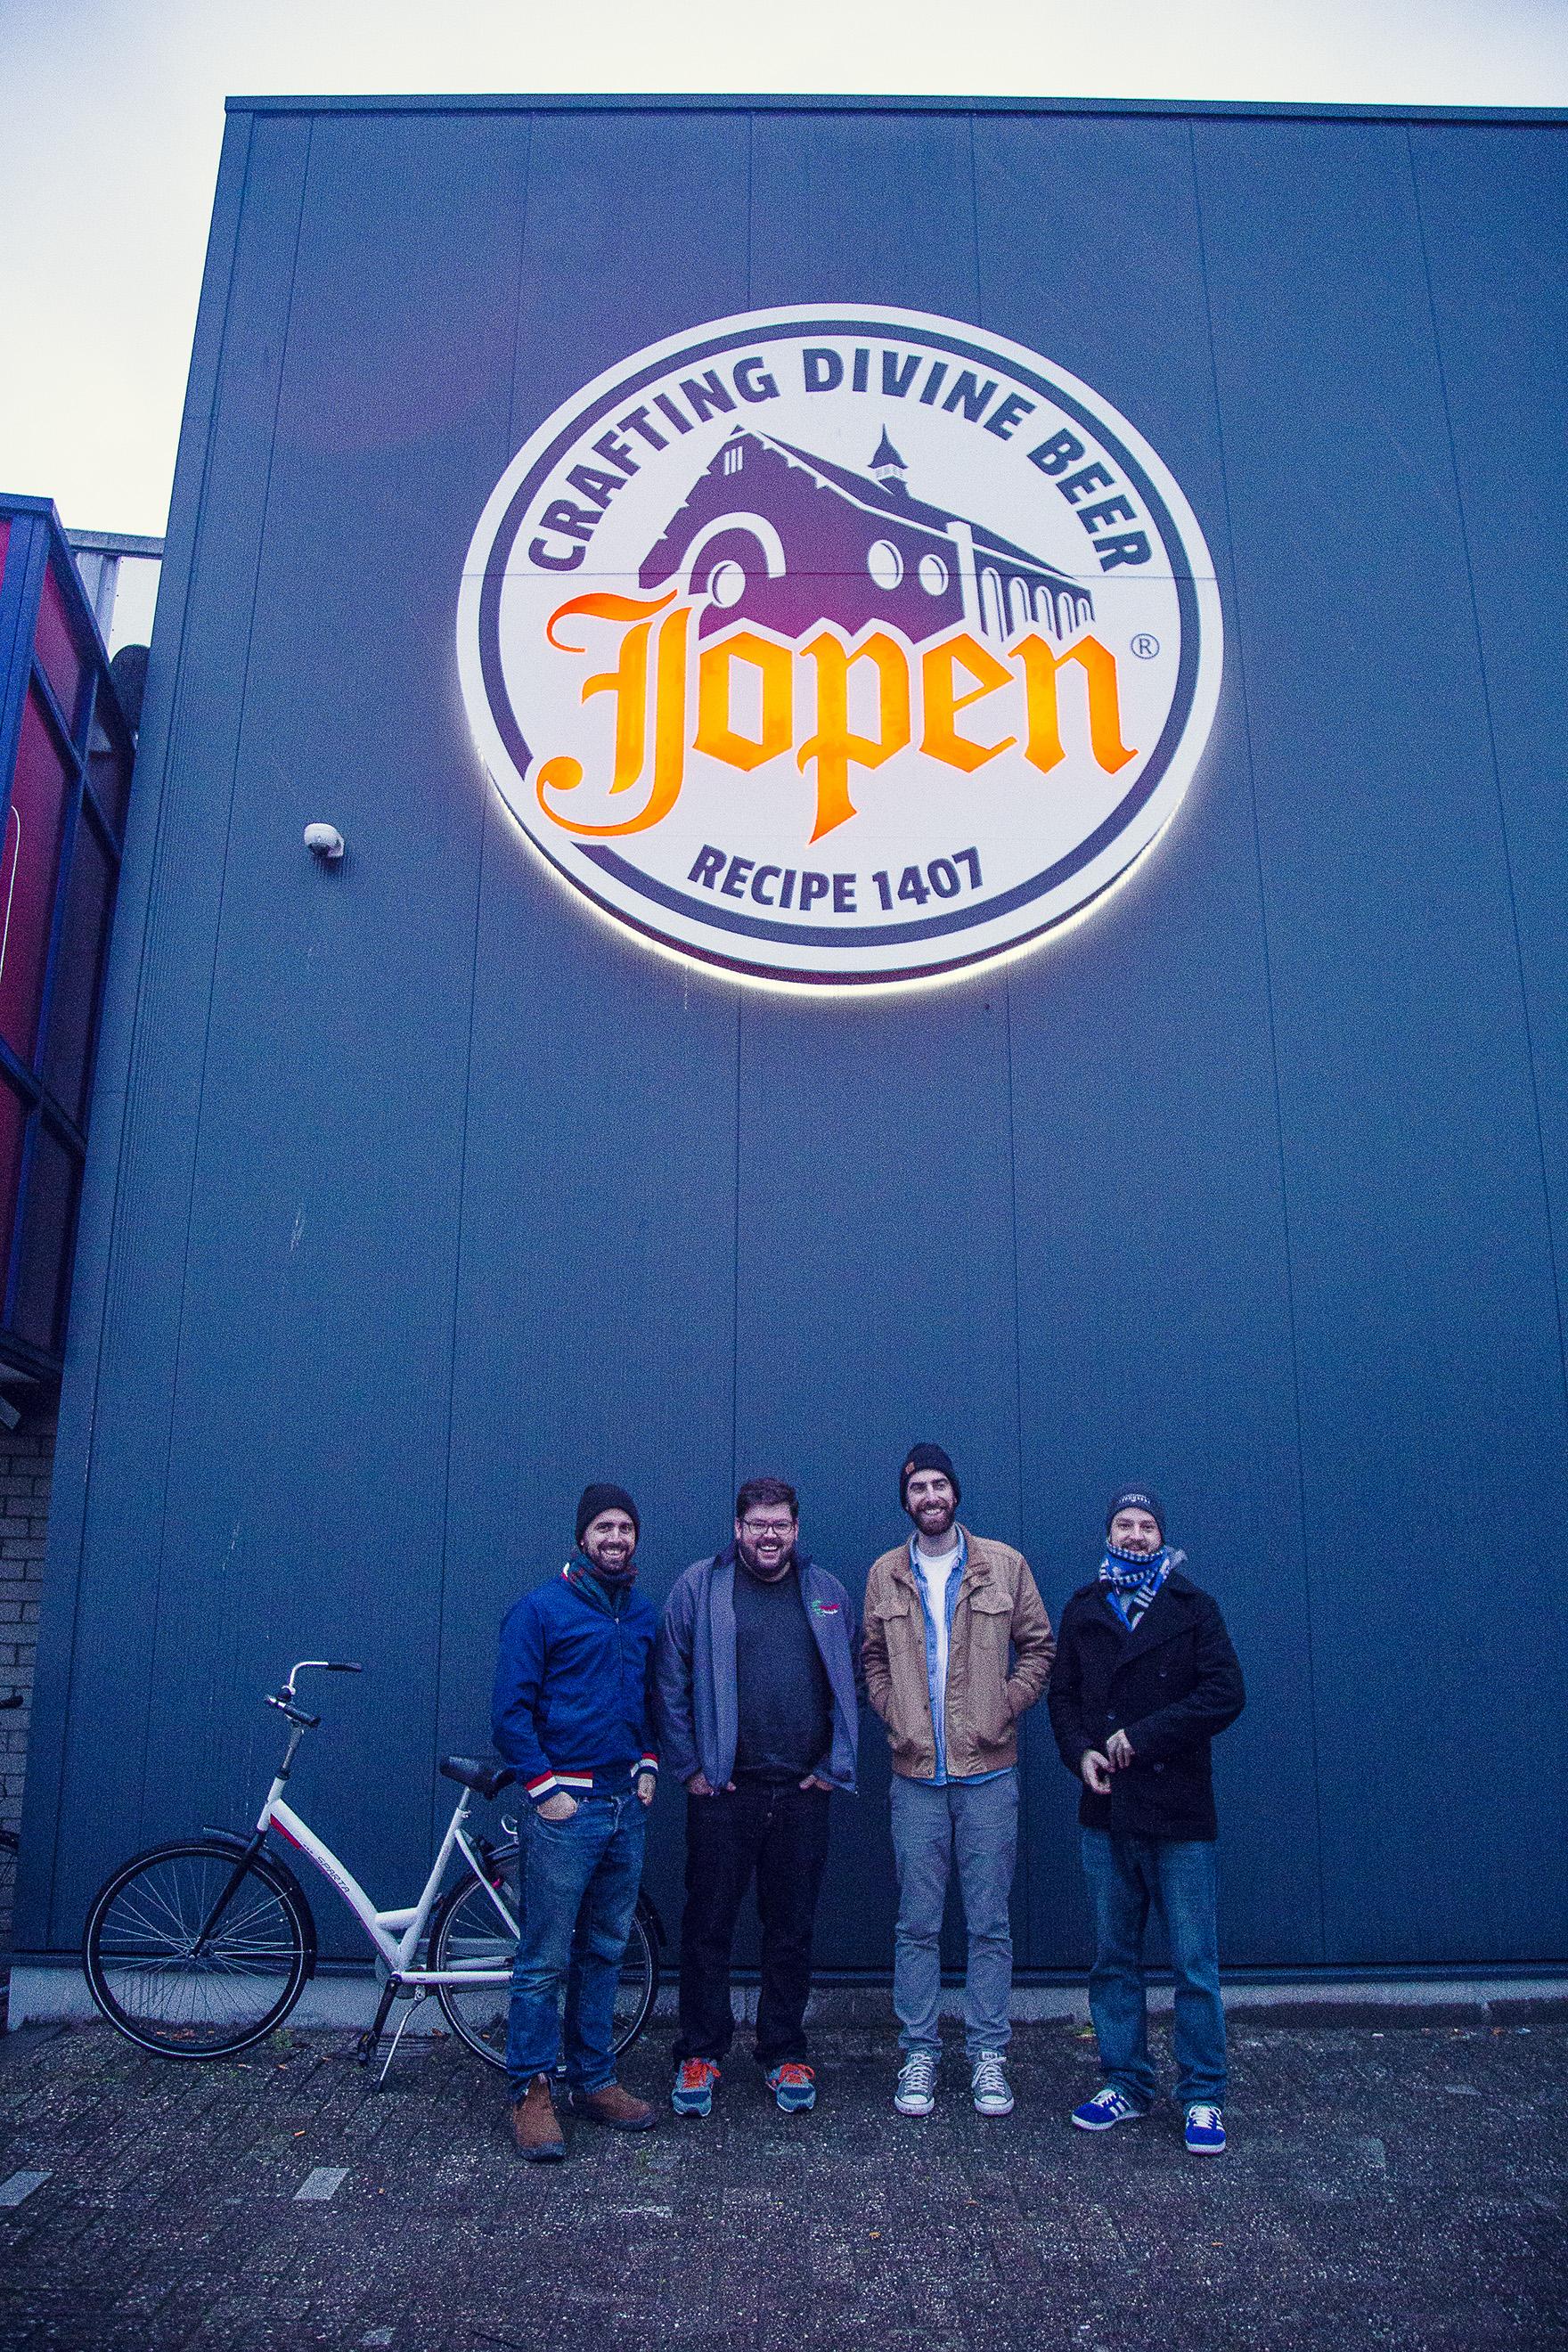 Jopen - Haarlem - Pays-Bas